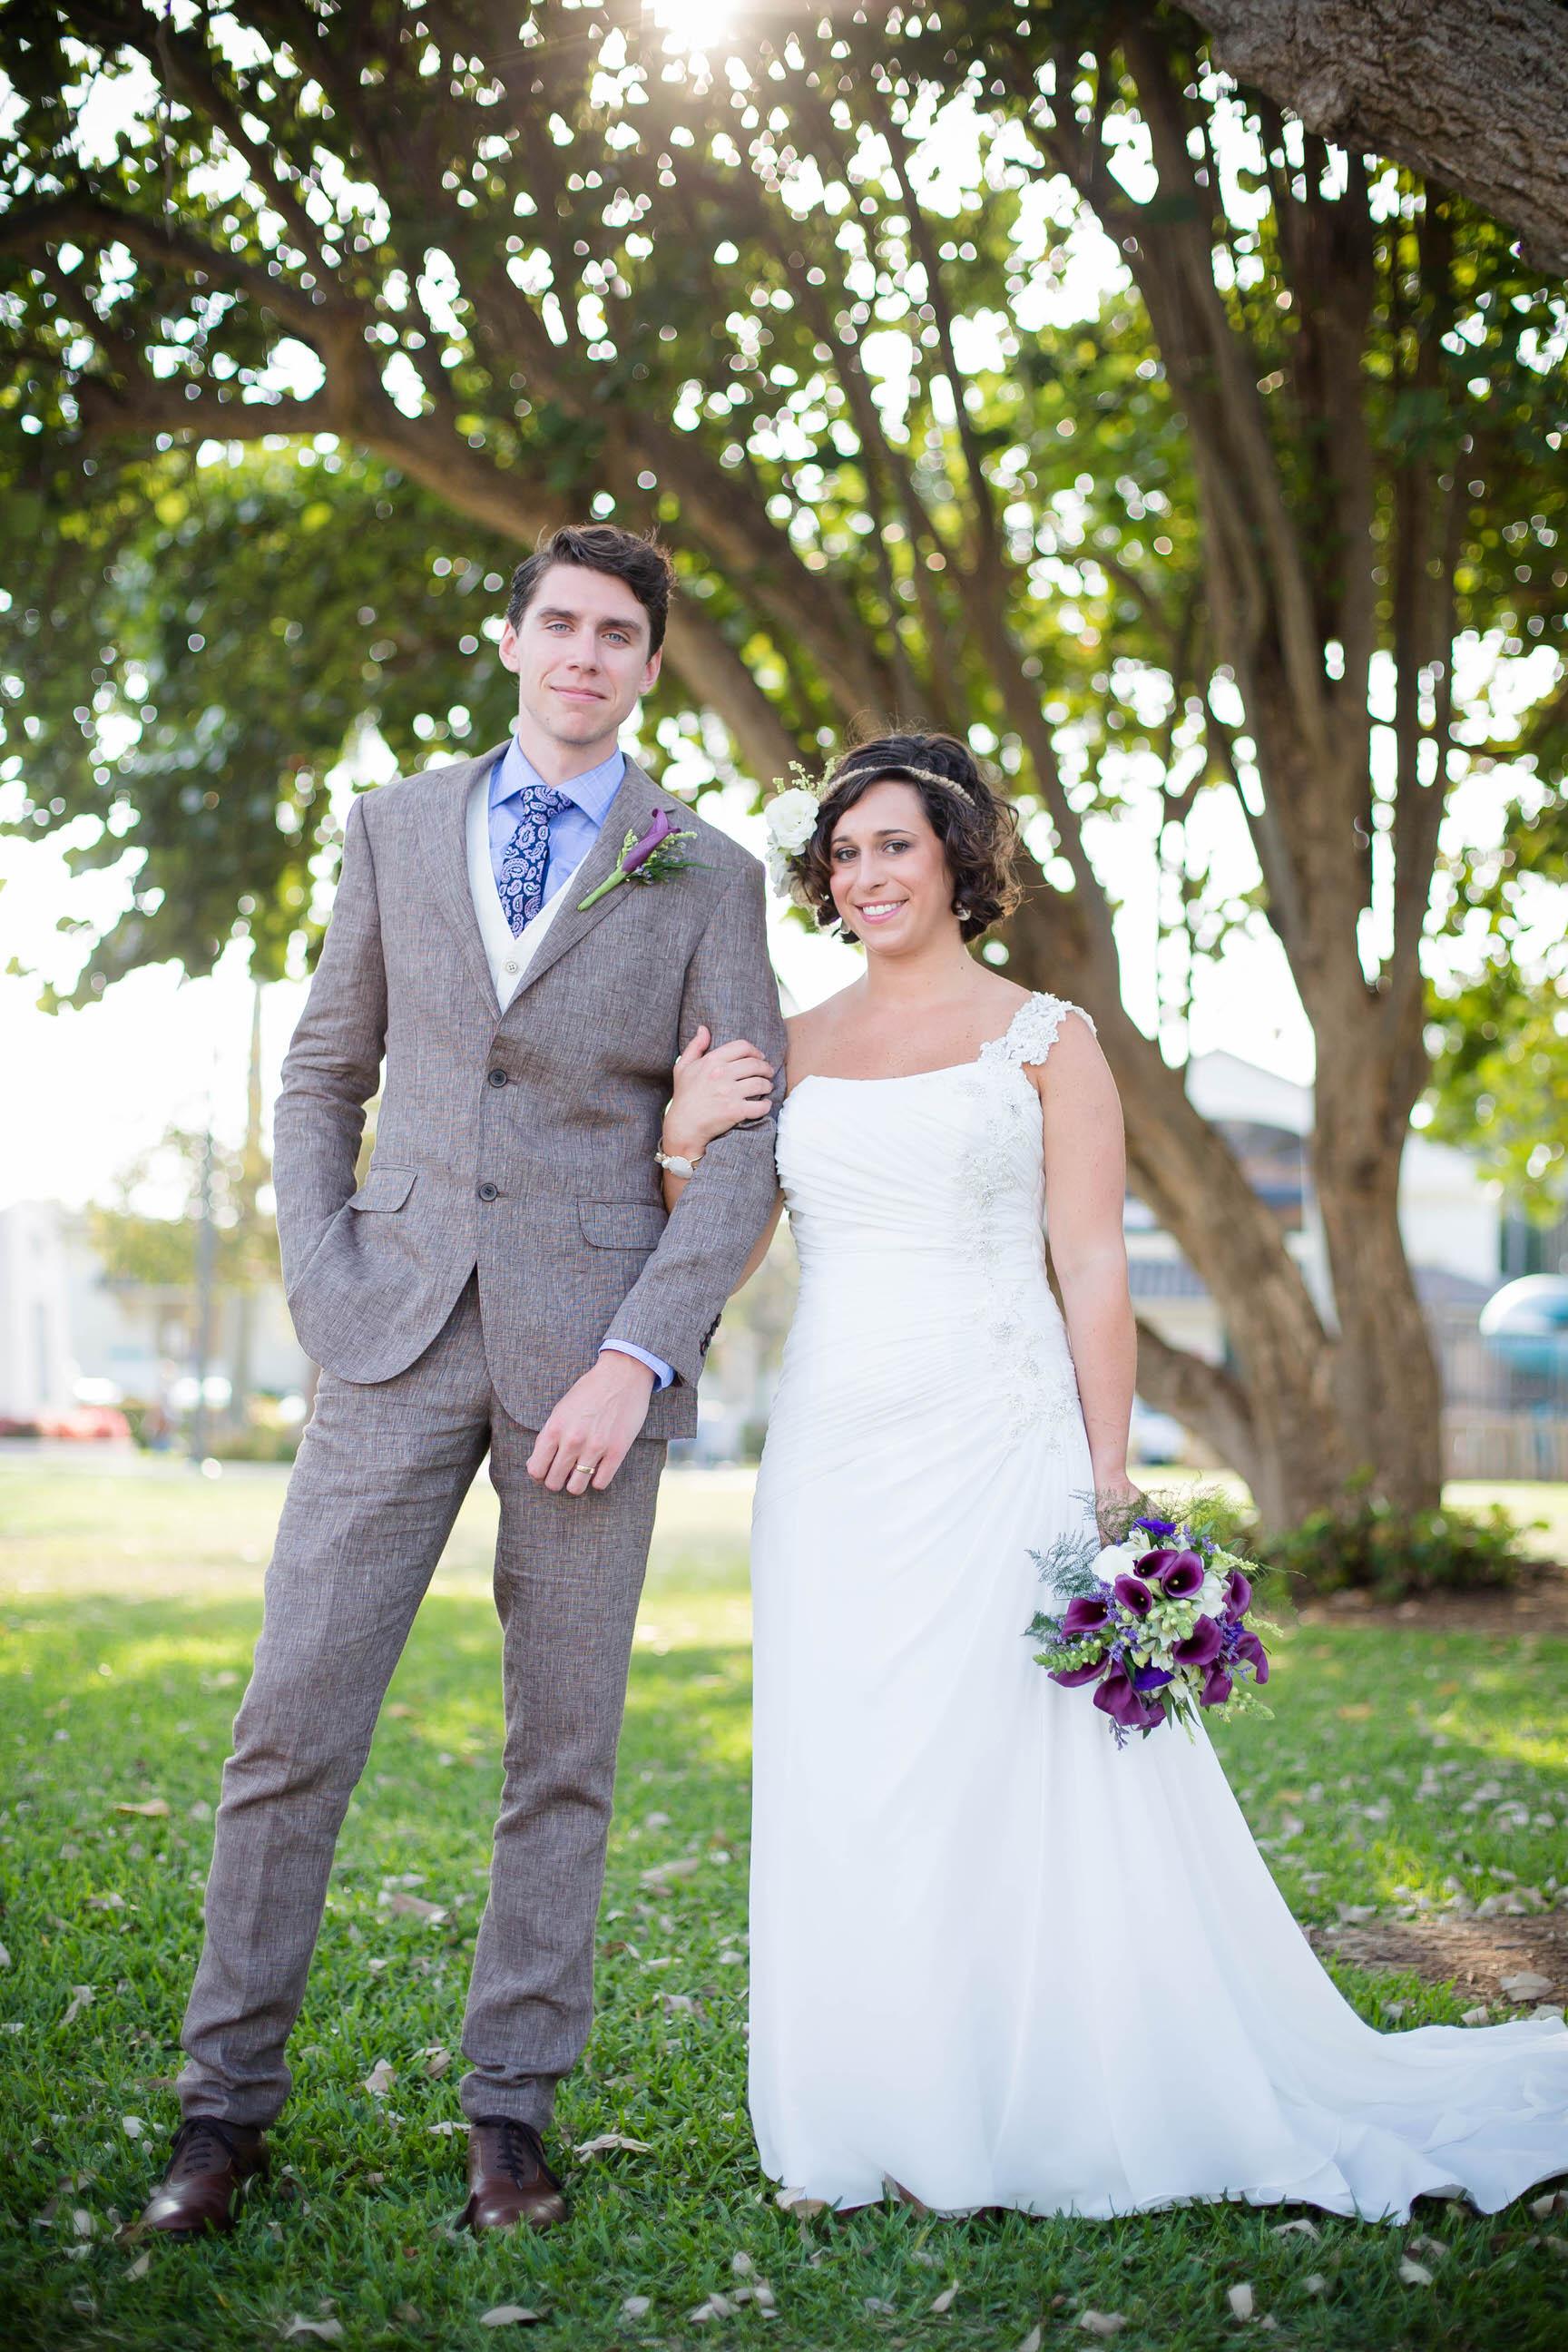 adorable-bride-groom-sunset-veterans-park-delray-florida-tiny-house-photo.jpg